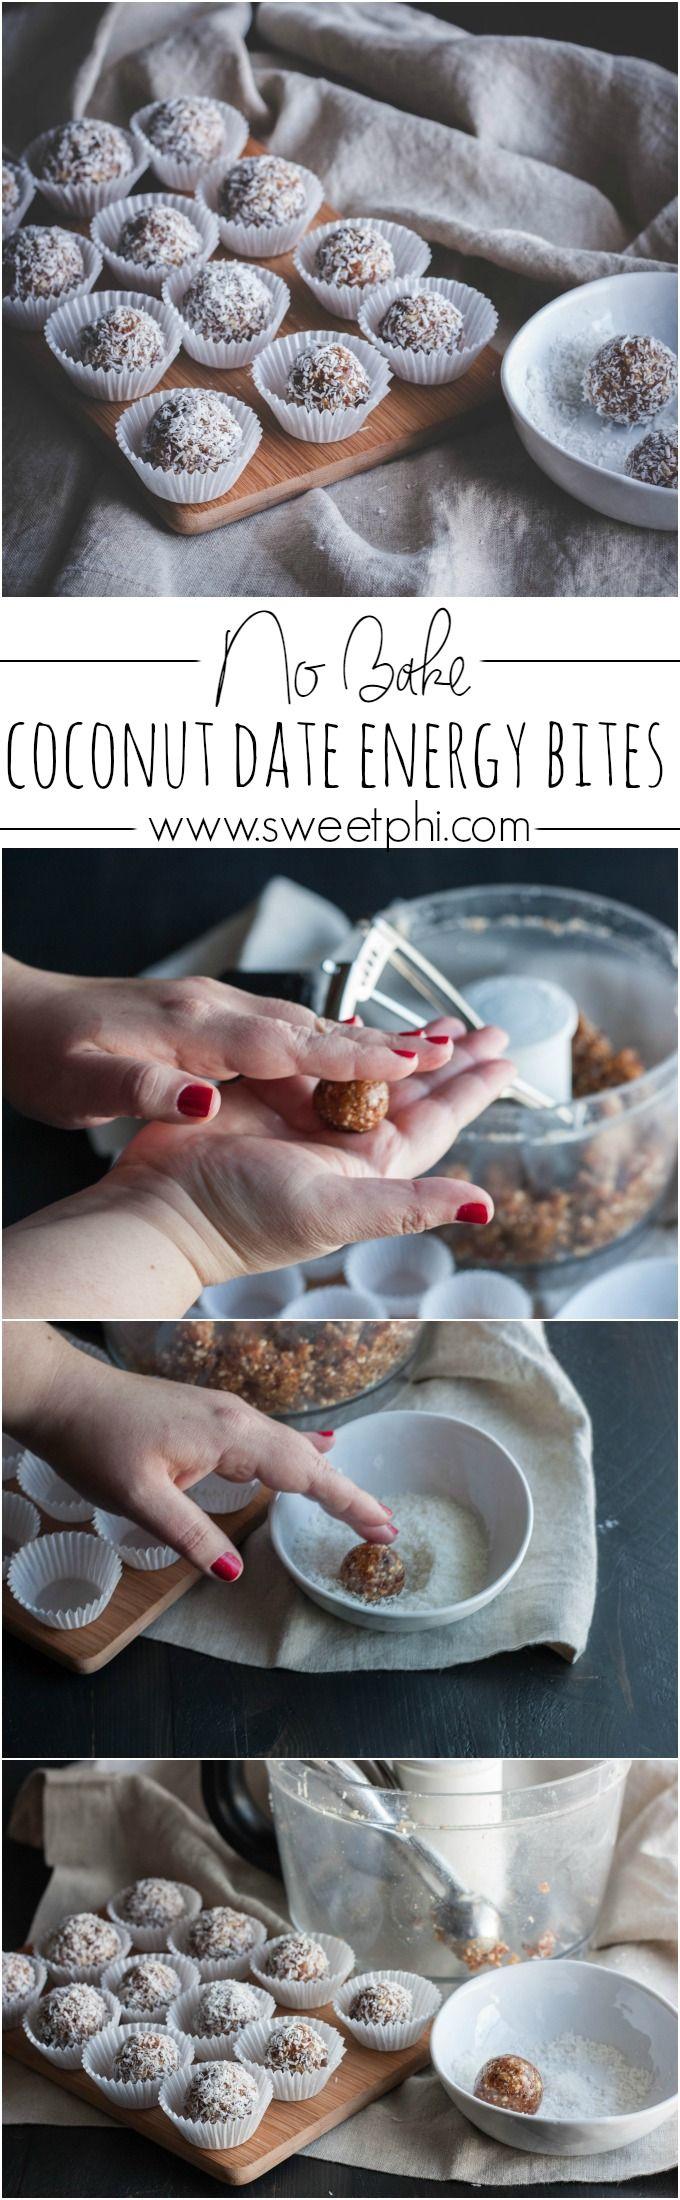 No bake coconut date energy bites, date energy balls, energy bites, date recipes, recipes with dates, no sugar added dessert, whole30 recipe, gluten free and vegan recipe